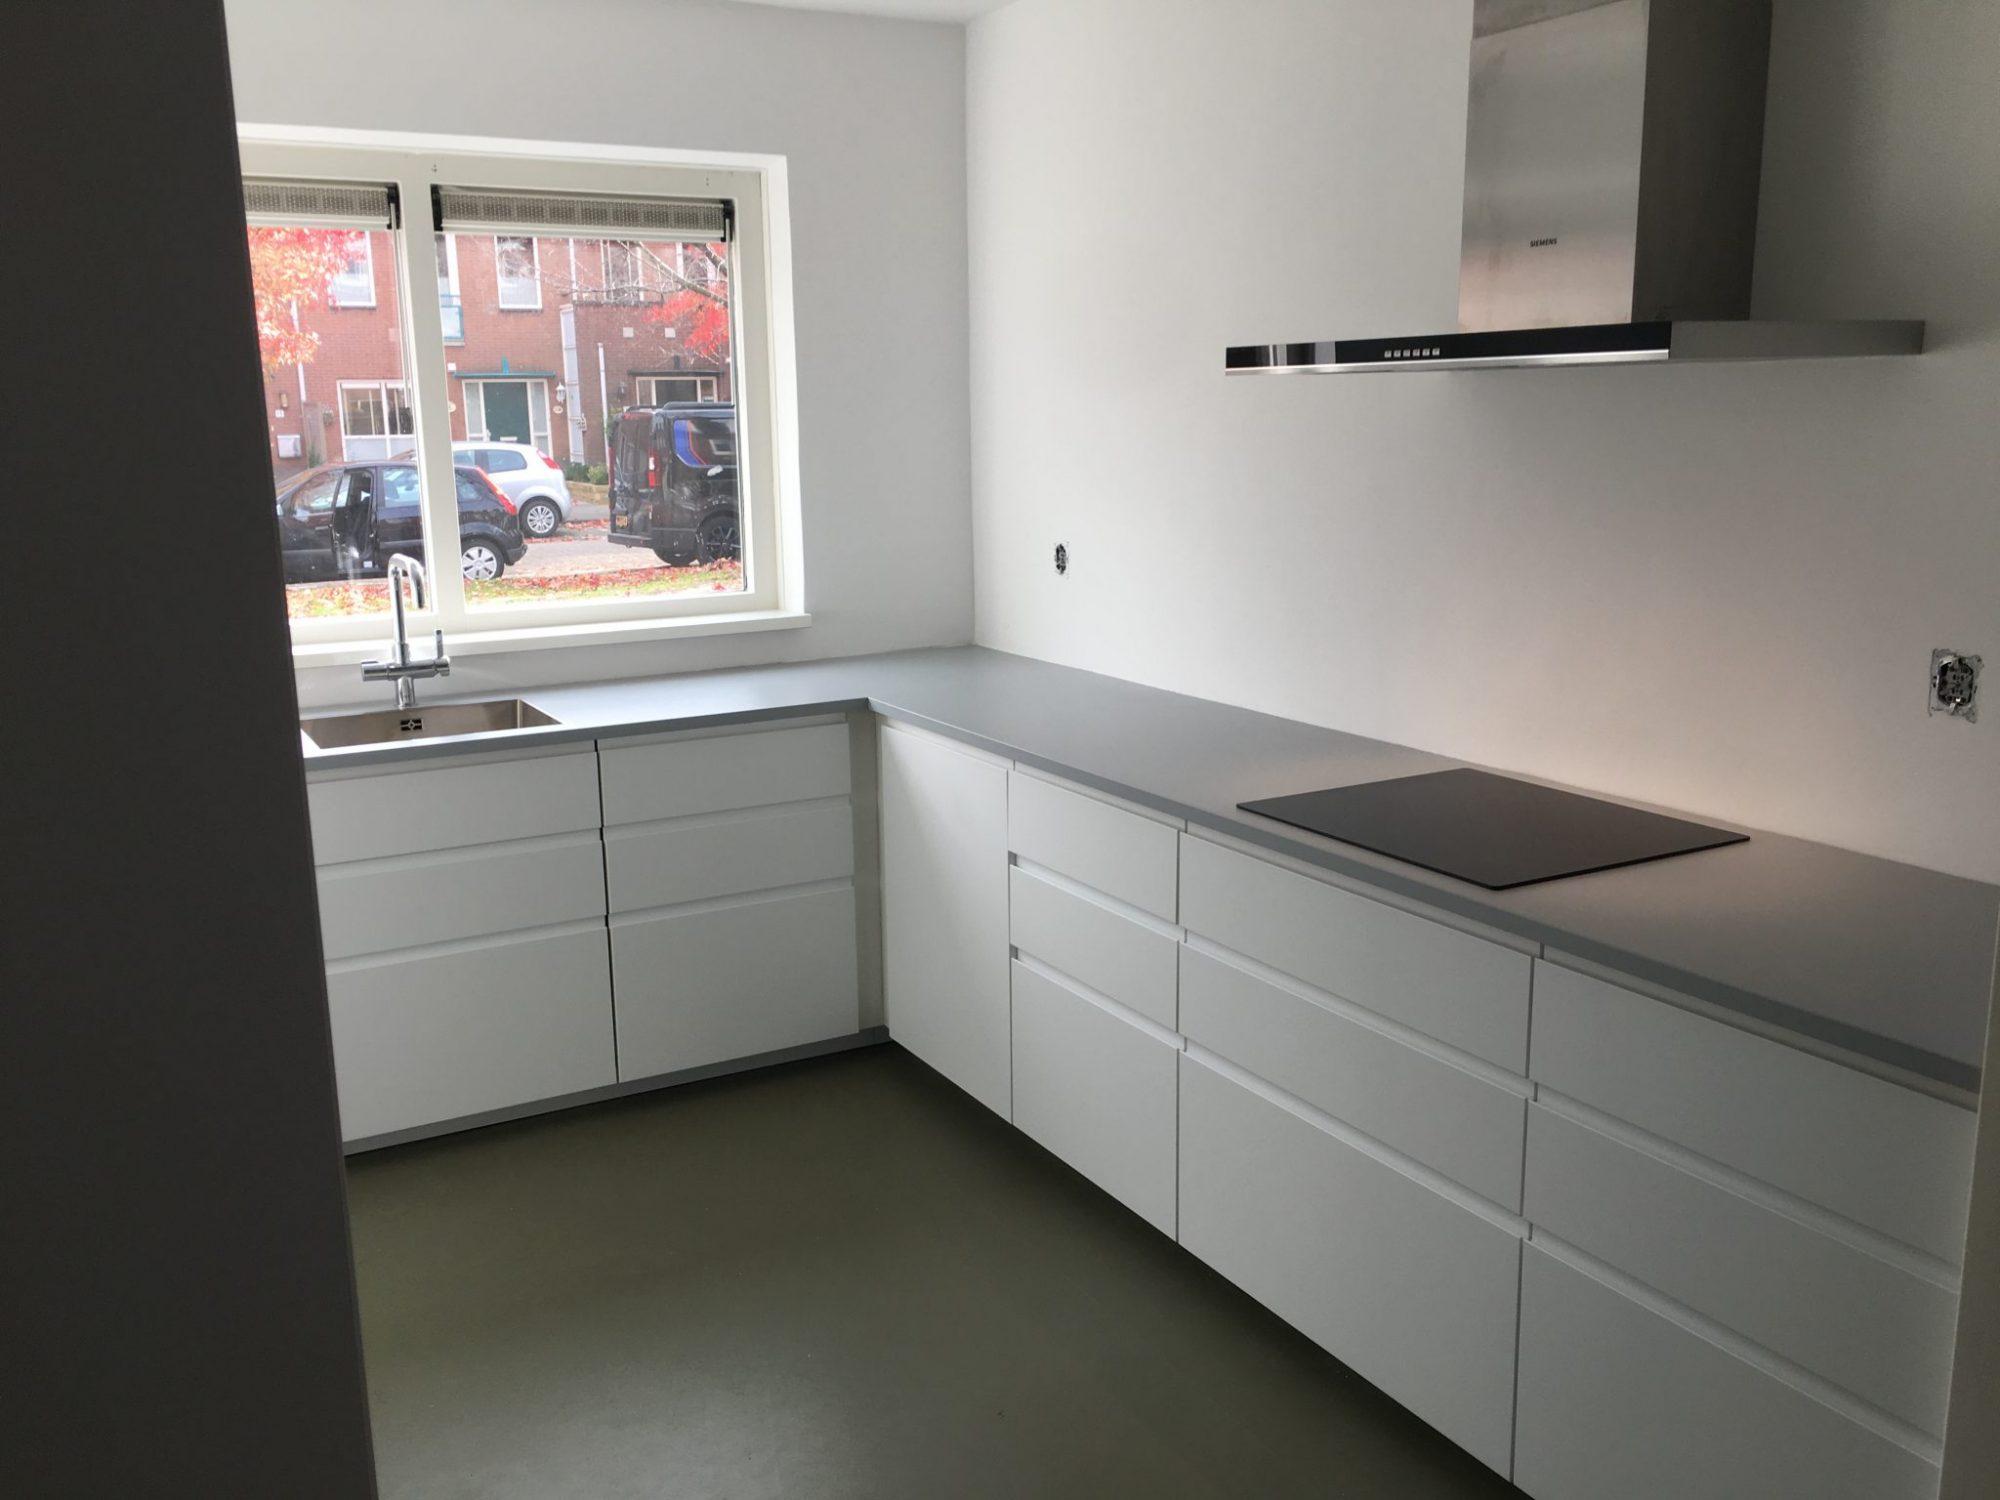 Ikea keuken met siemens apparatuur maassluis marco for Keuken samenstellen ikea